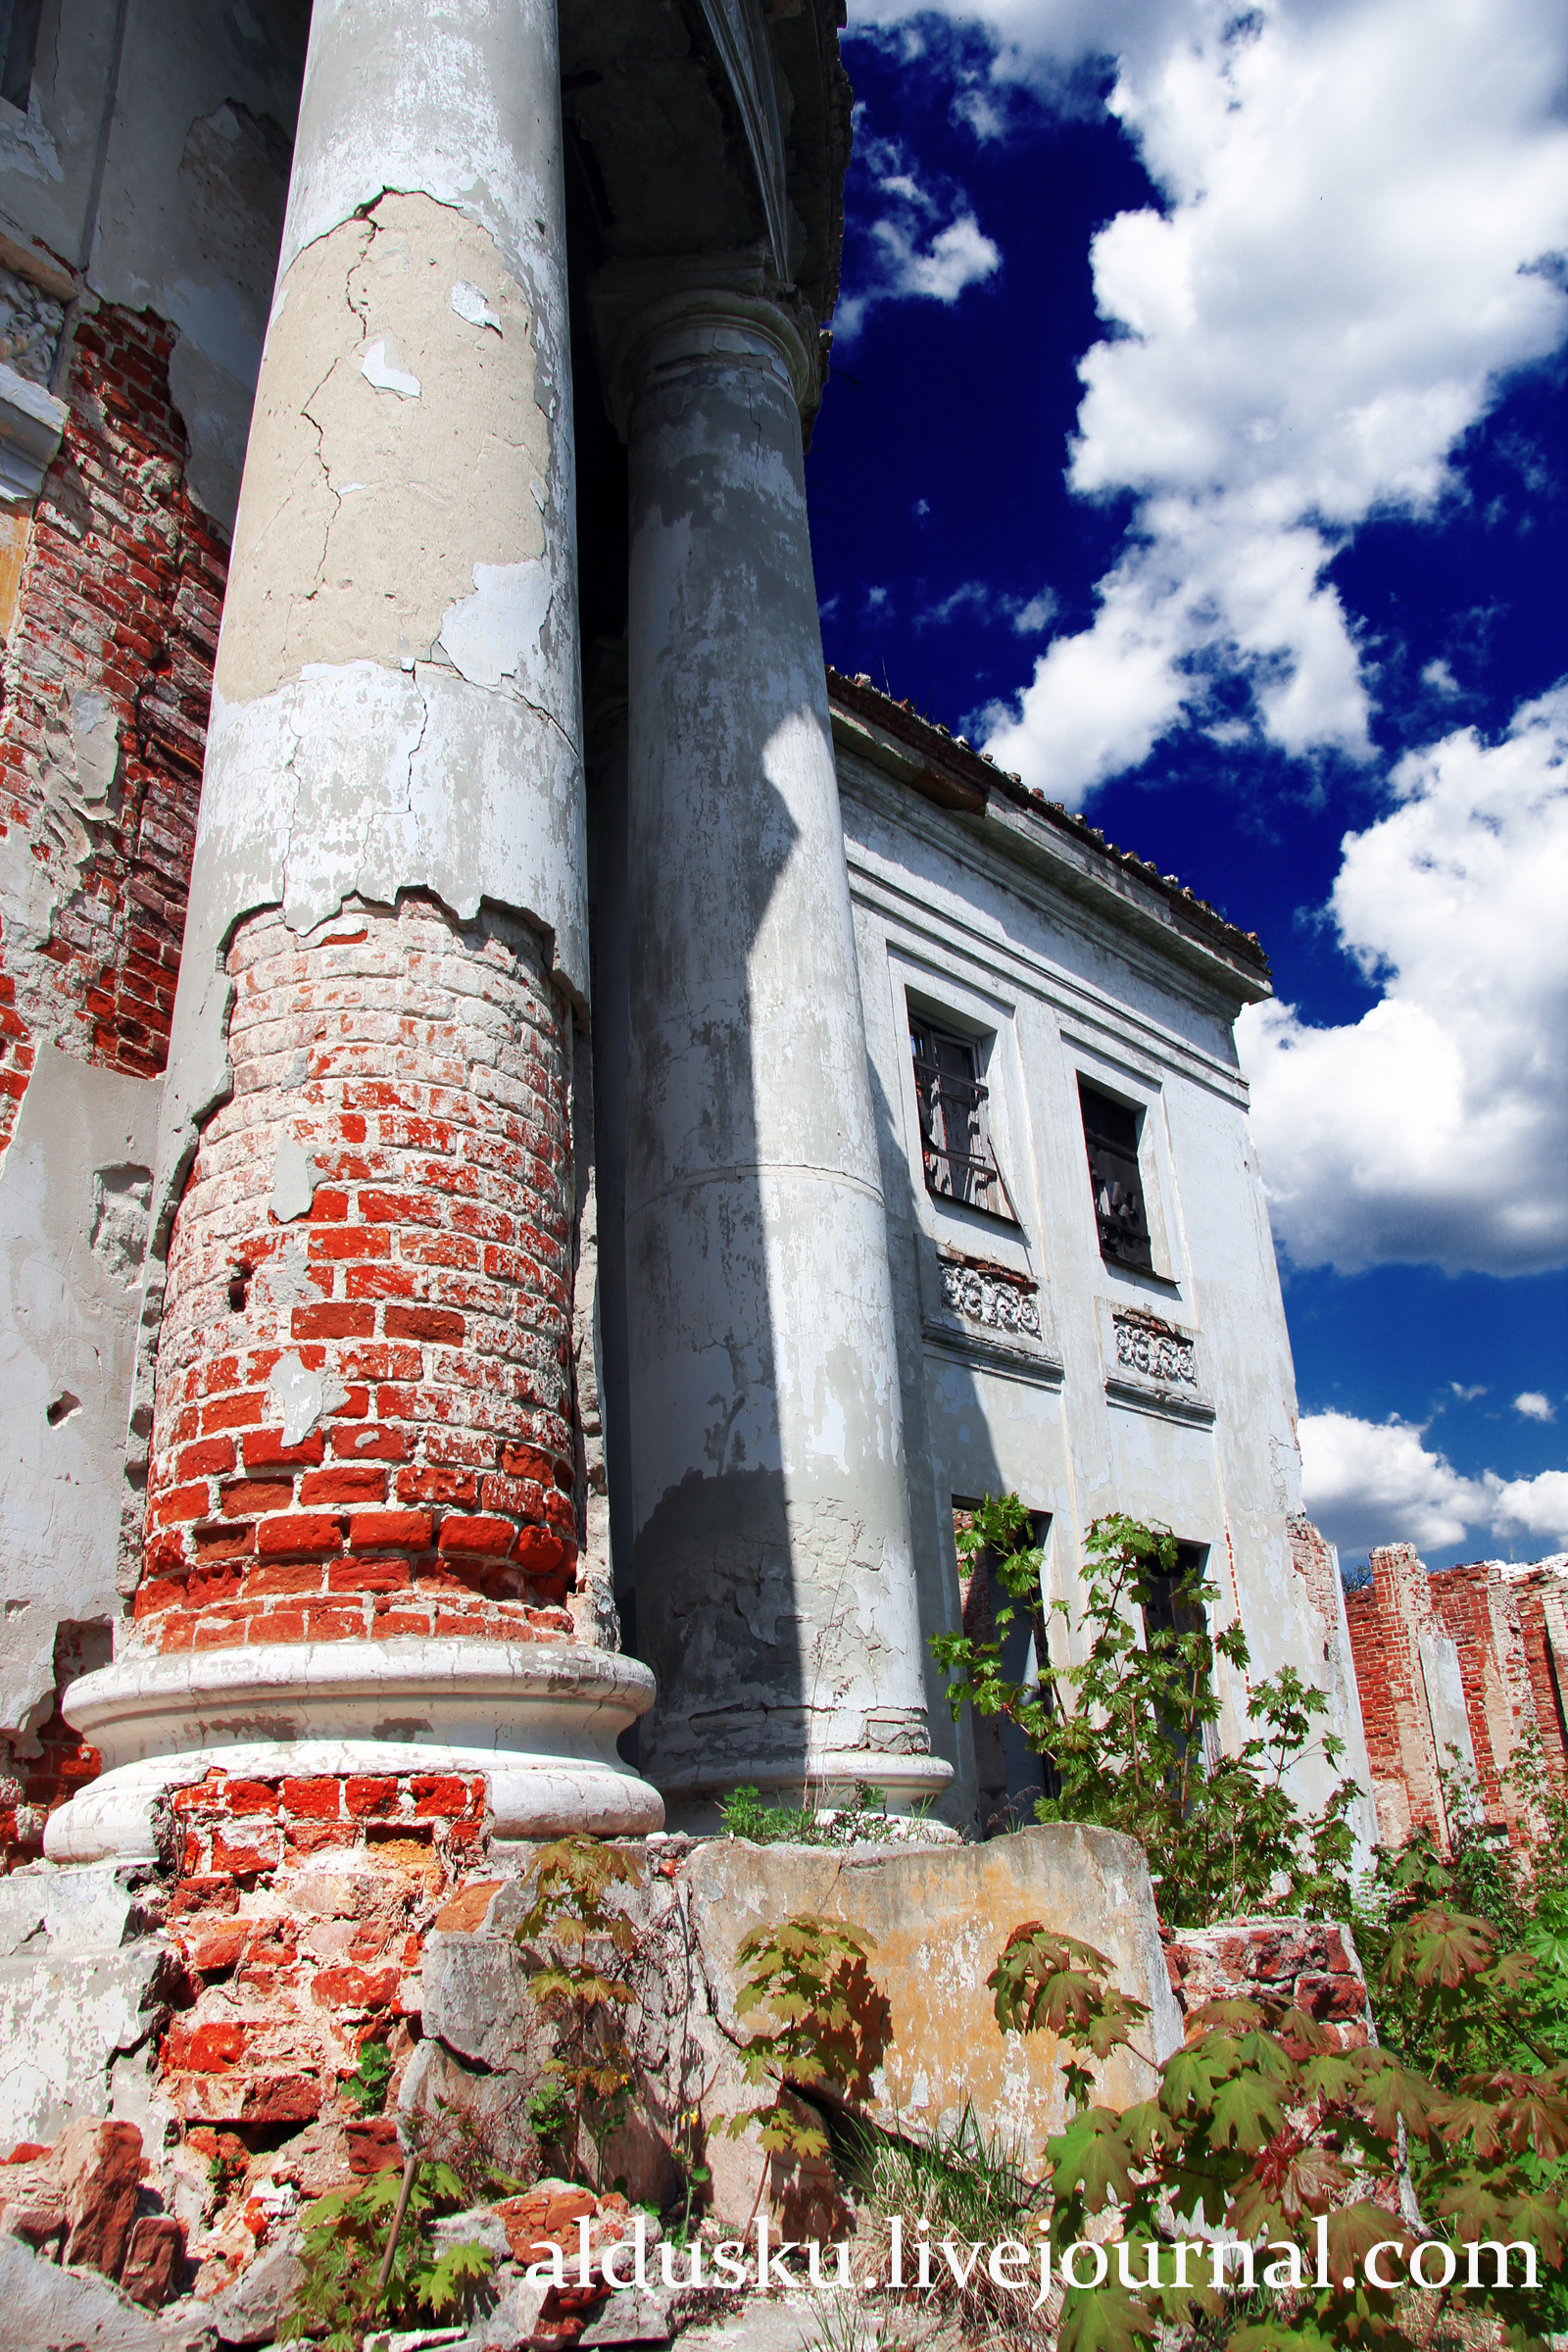 Фомин И.А. Московский классицизм. Архитектура в Москве во времена Екатерины II и Александра I (ч. II)